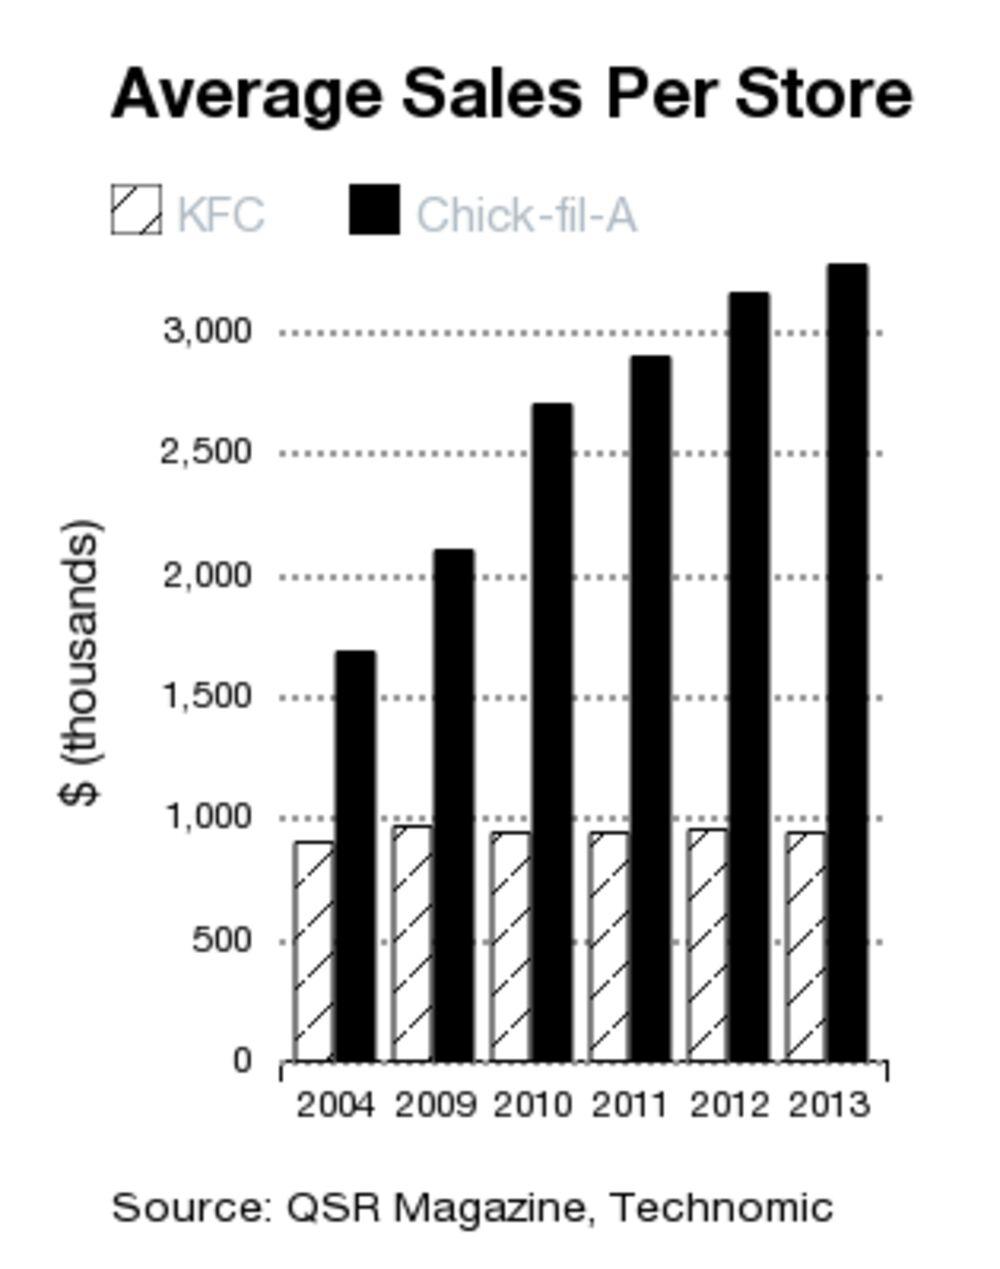 chick fil a competitive advantage